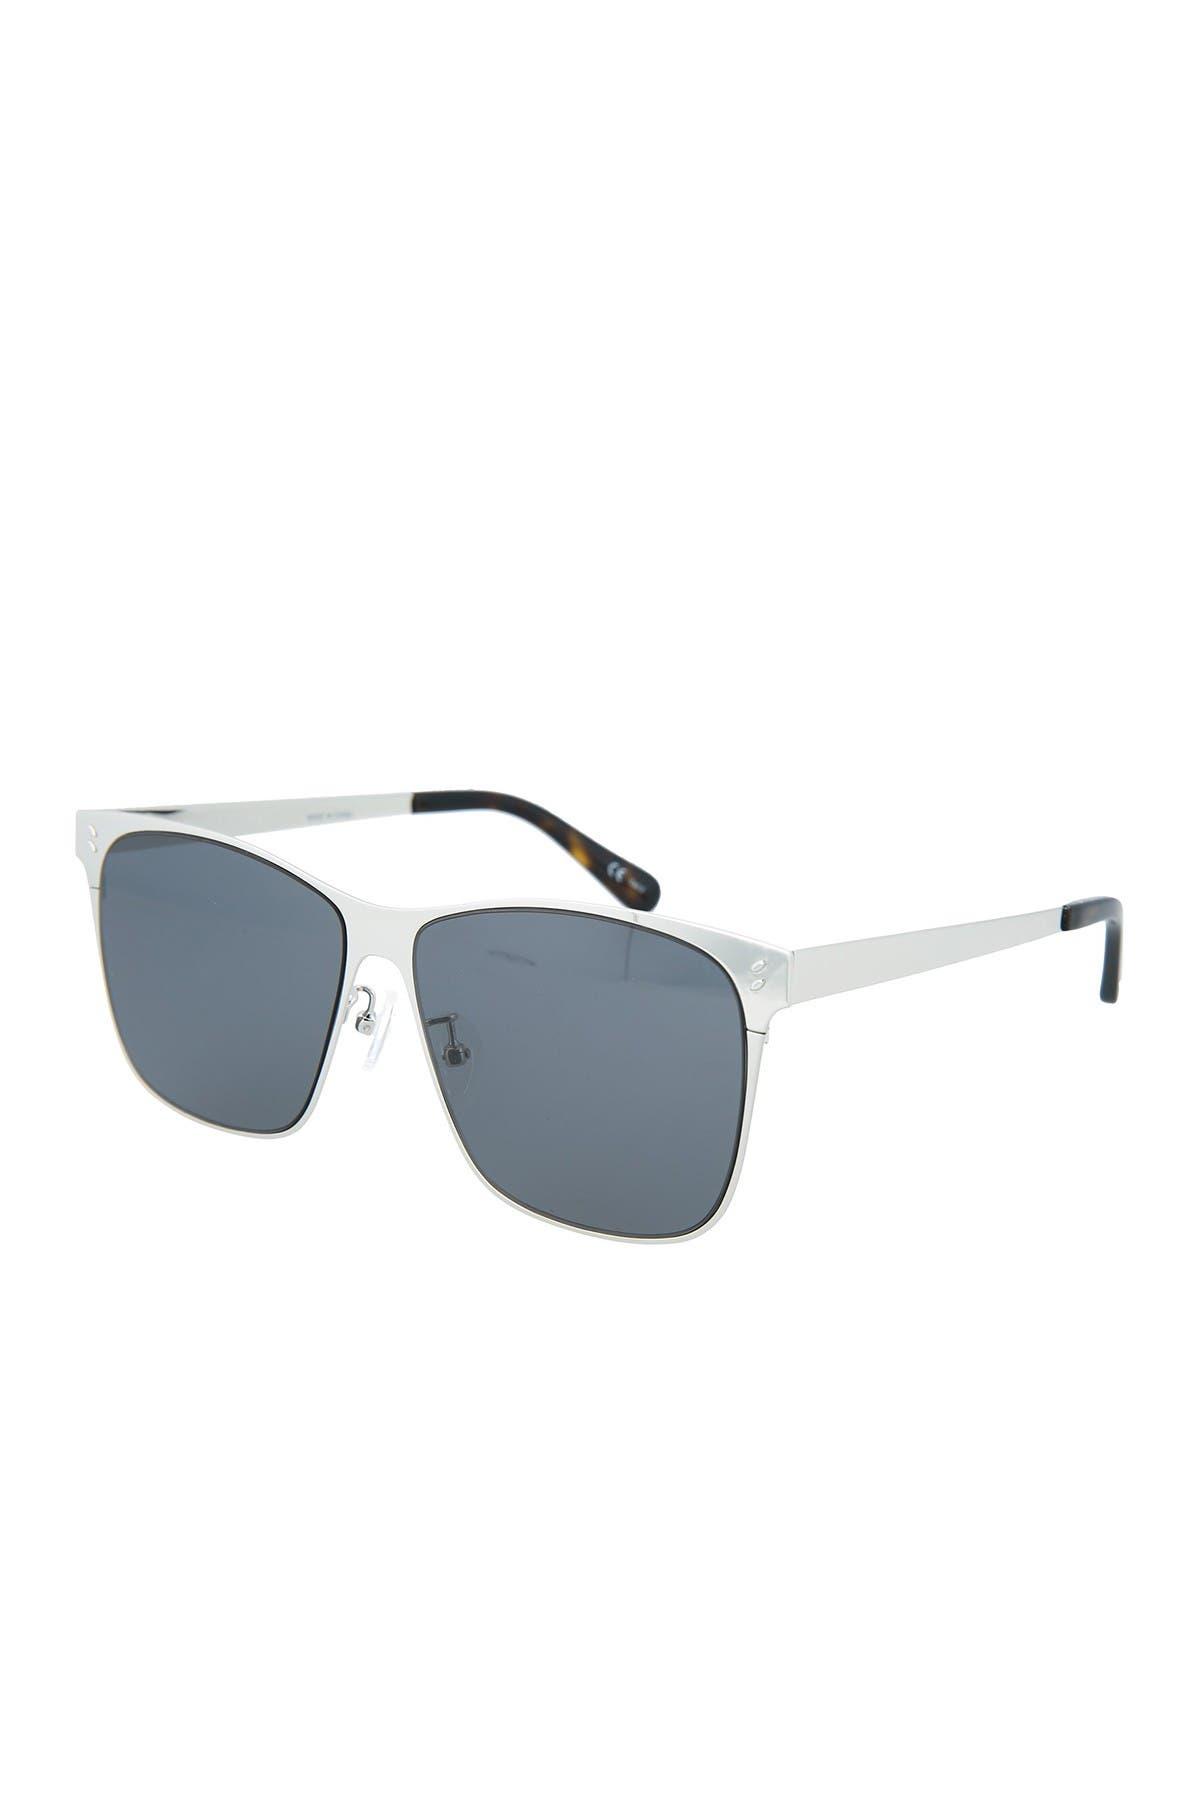 Image of Stella McCartney 45mm Square Sunglasses